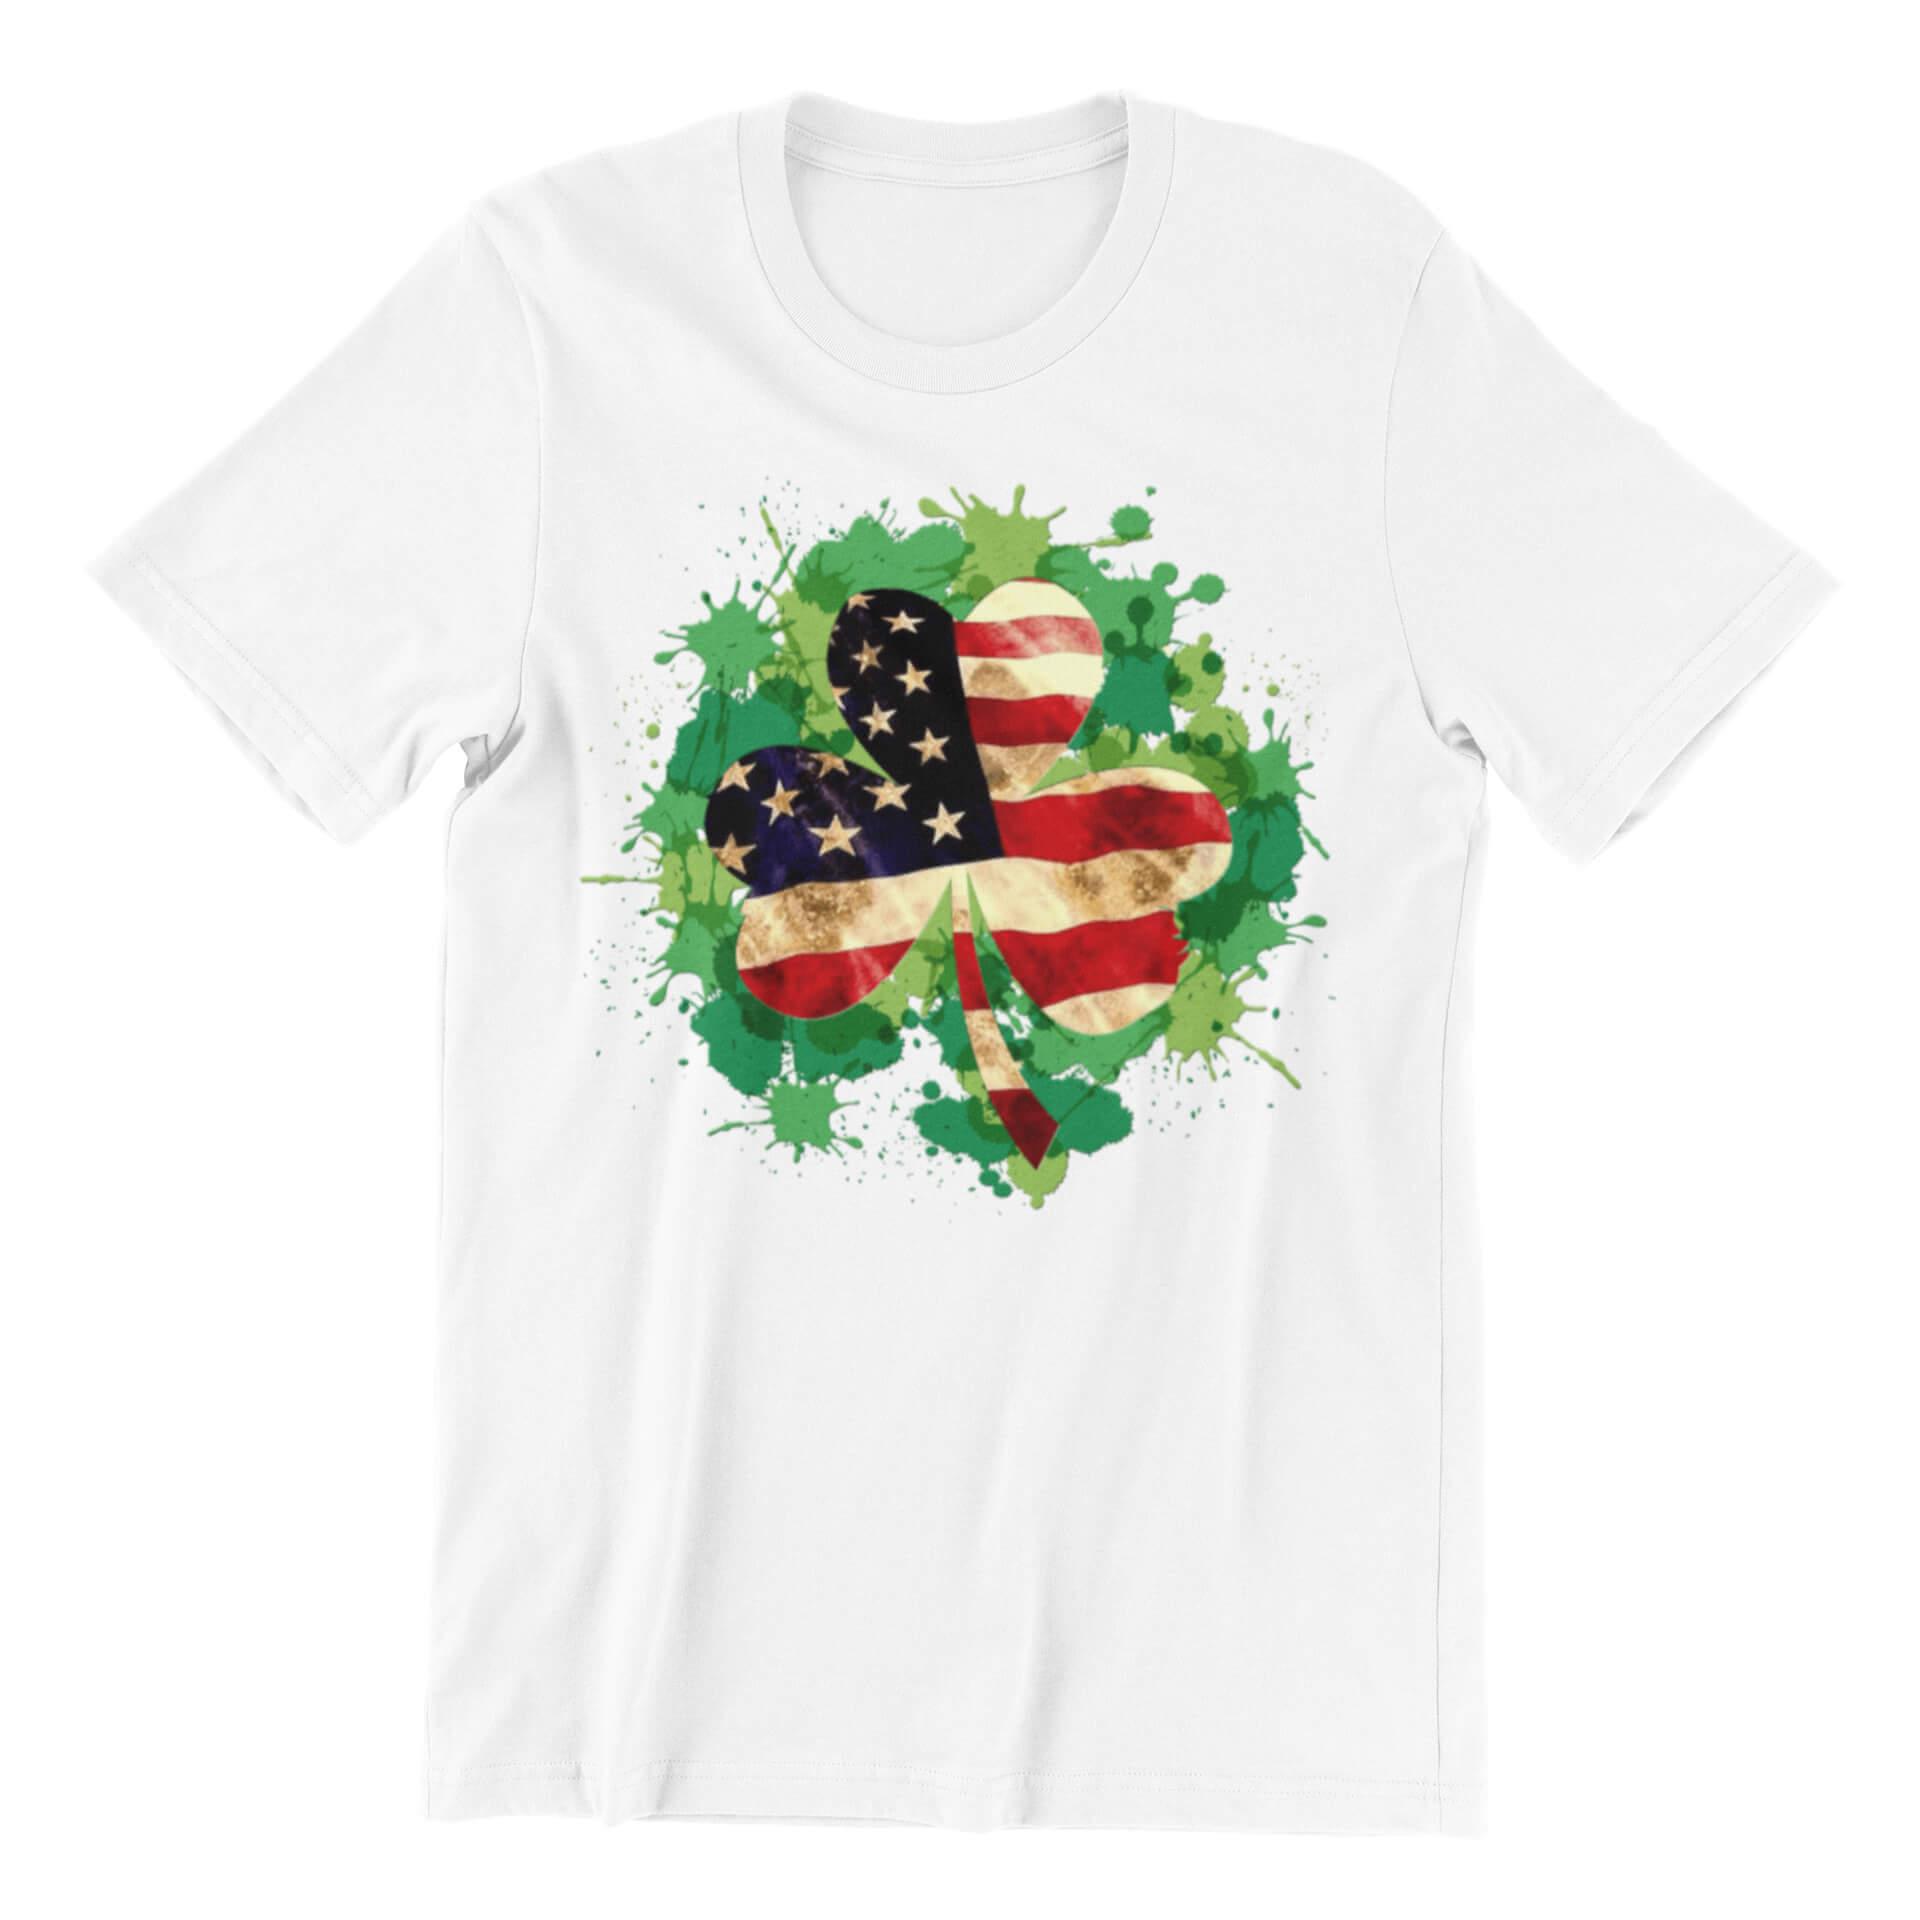 USA Flag Clover T-Shirt